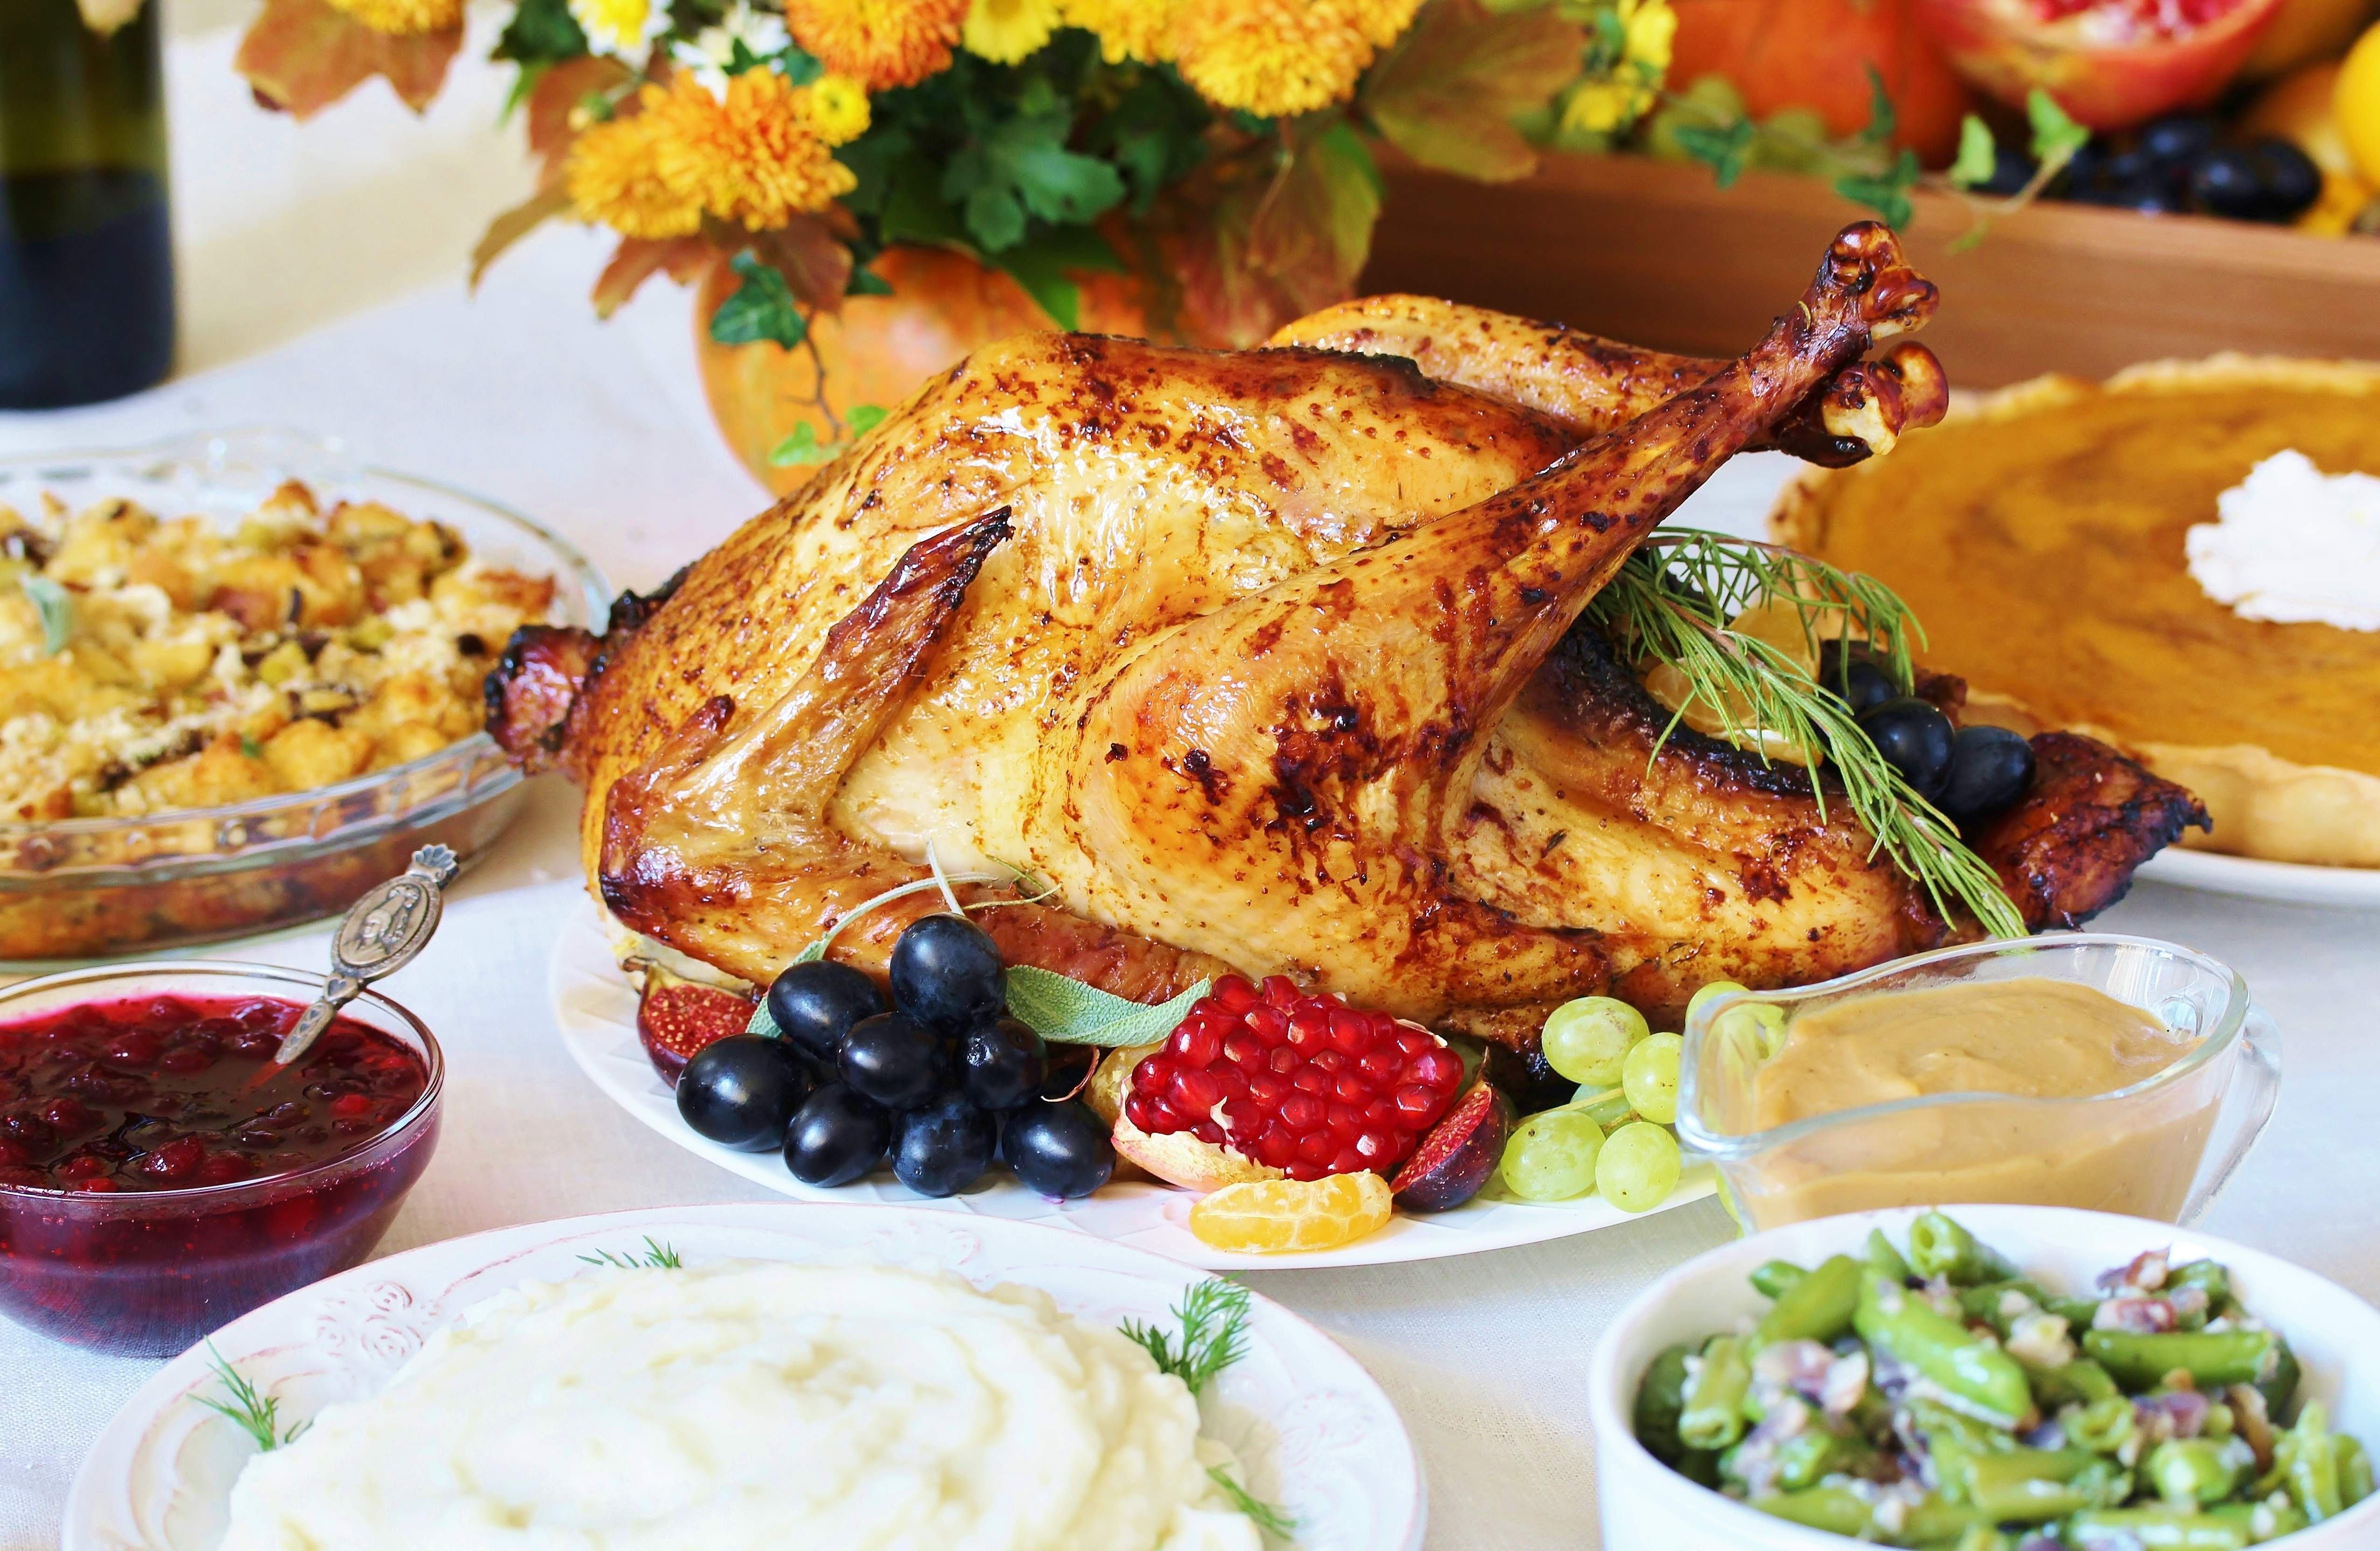 Thanksgiving Breakfast Restaurants  Best restaurants open on Thanksgiving 2017 which offer